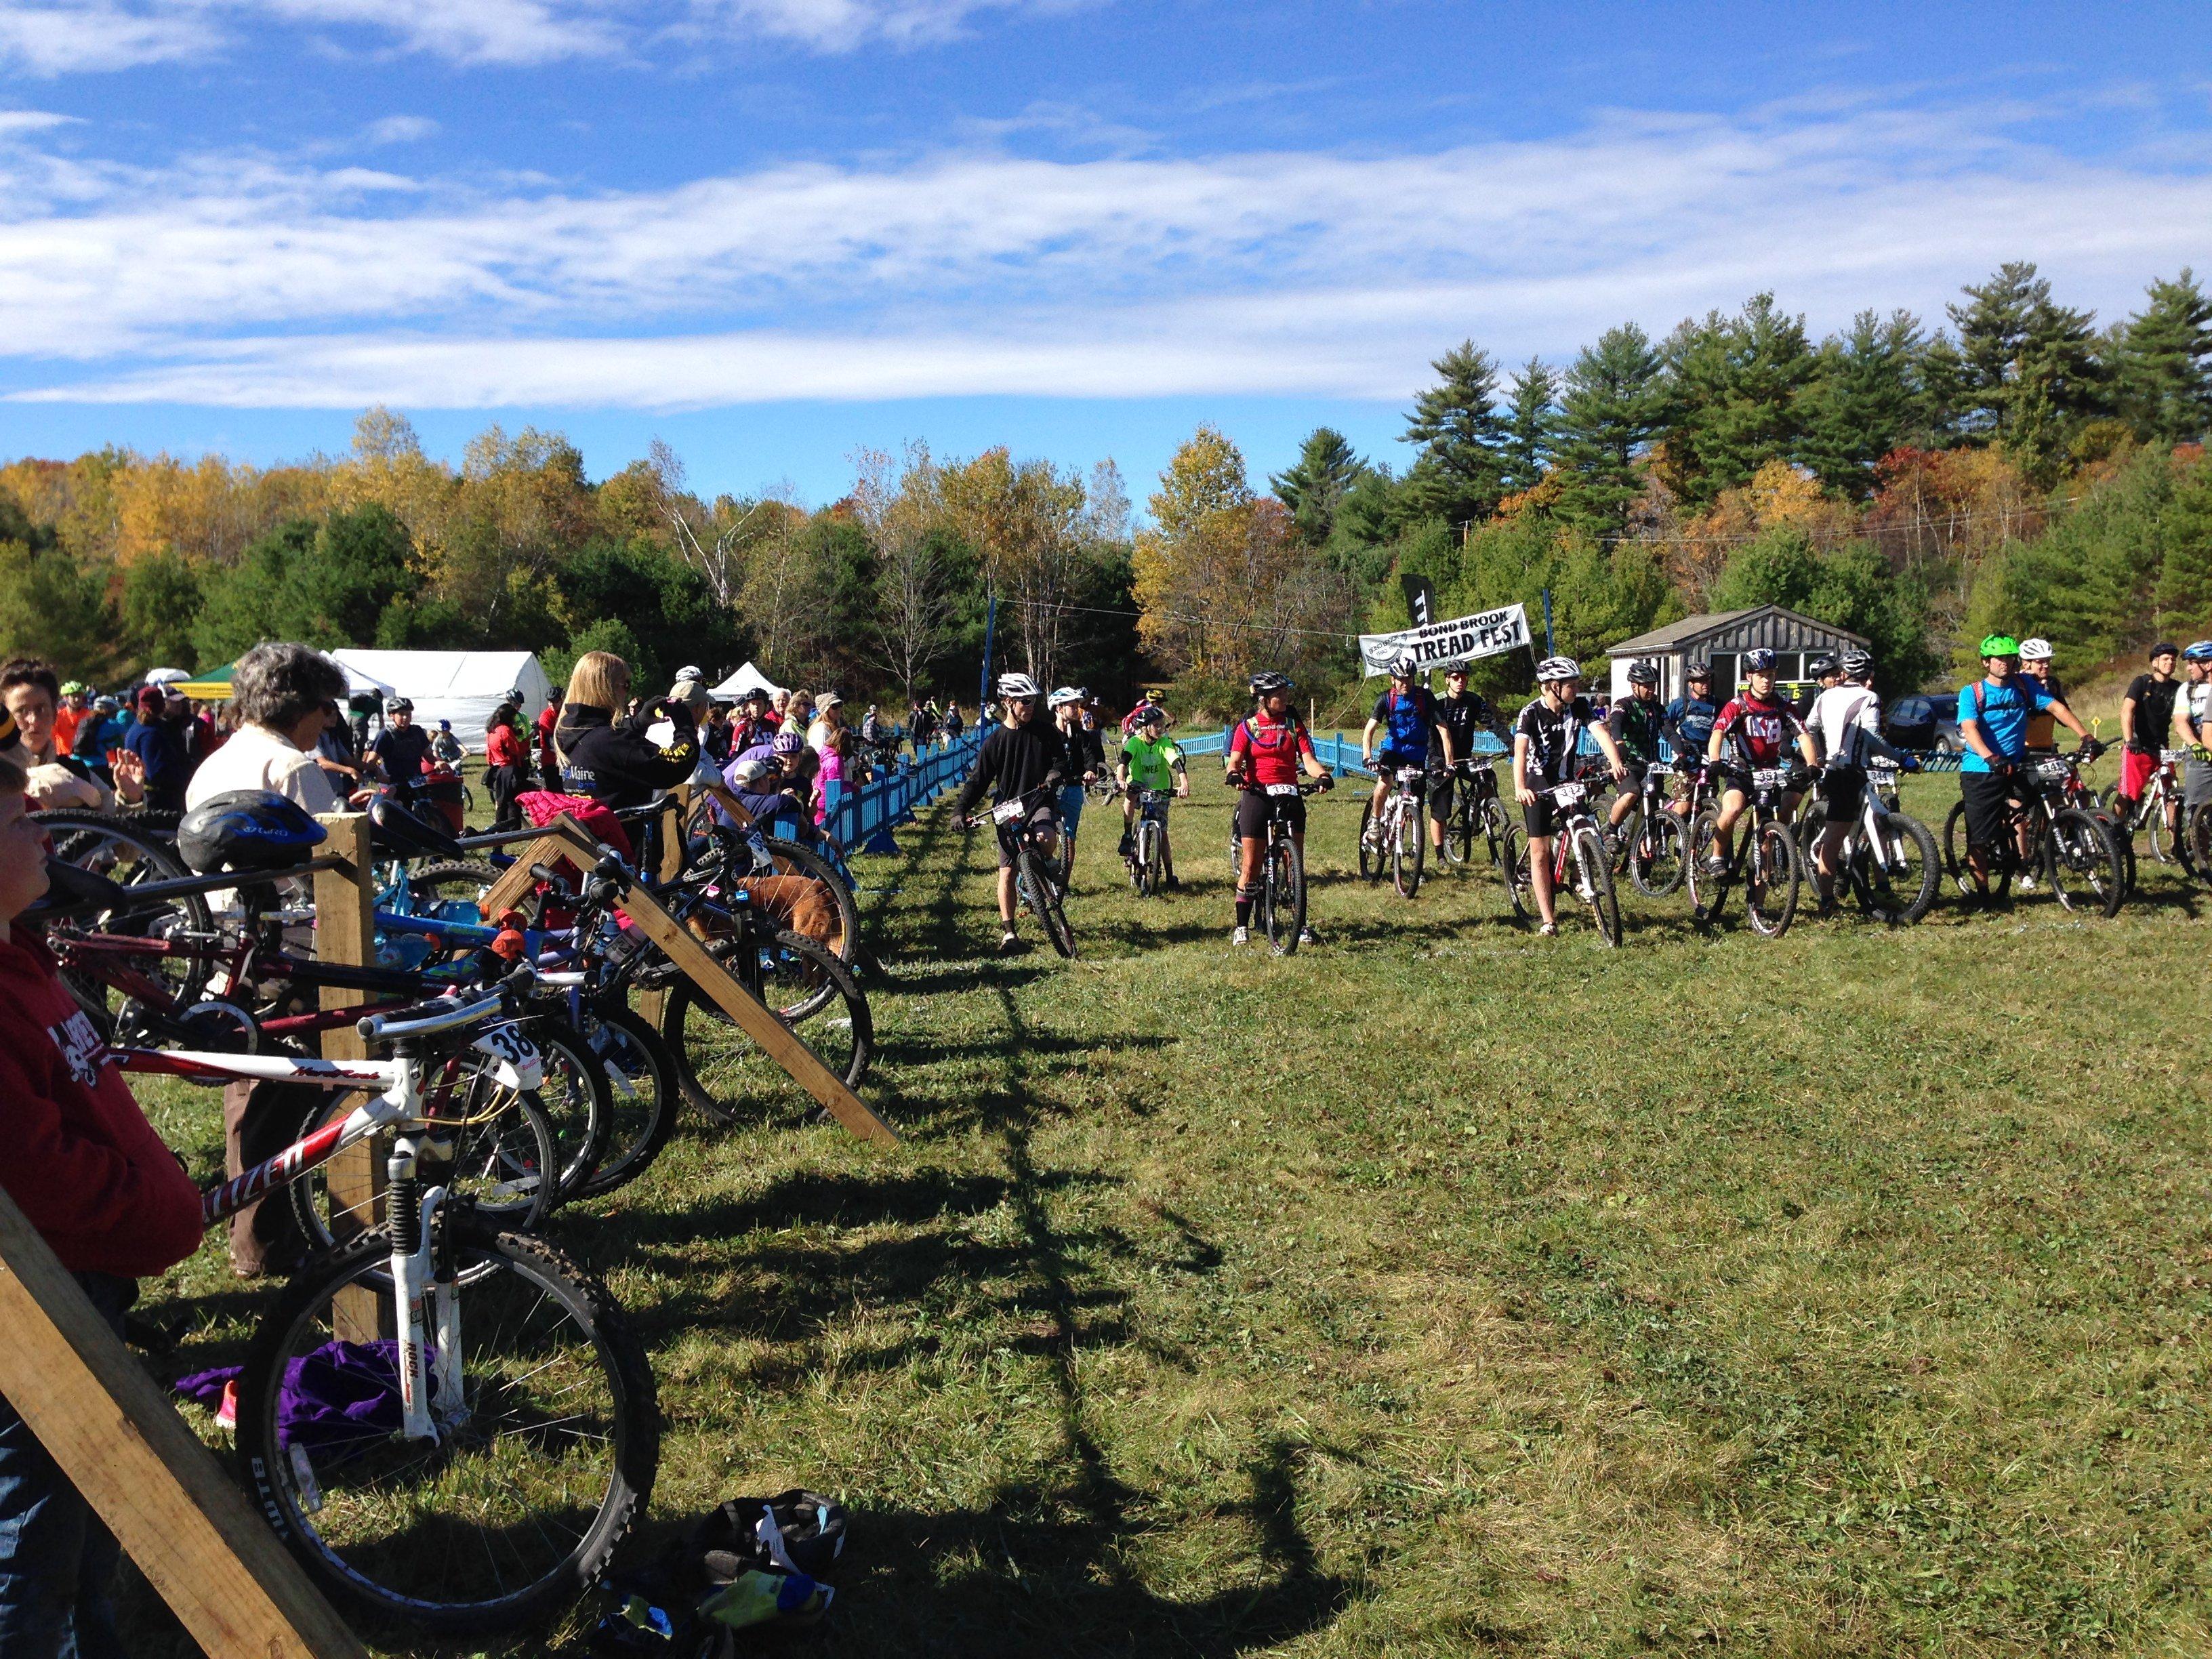 Local bike event